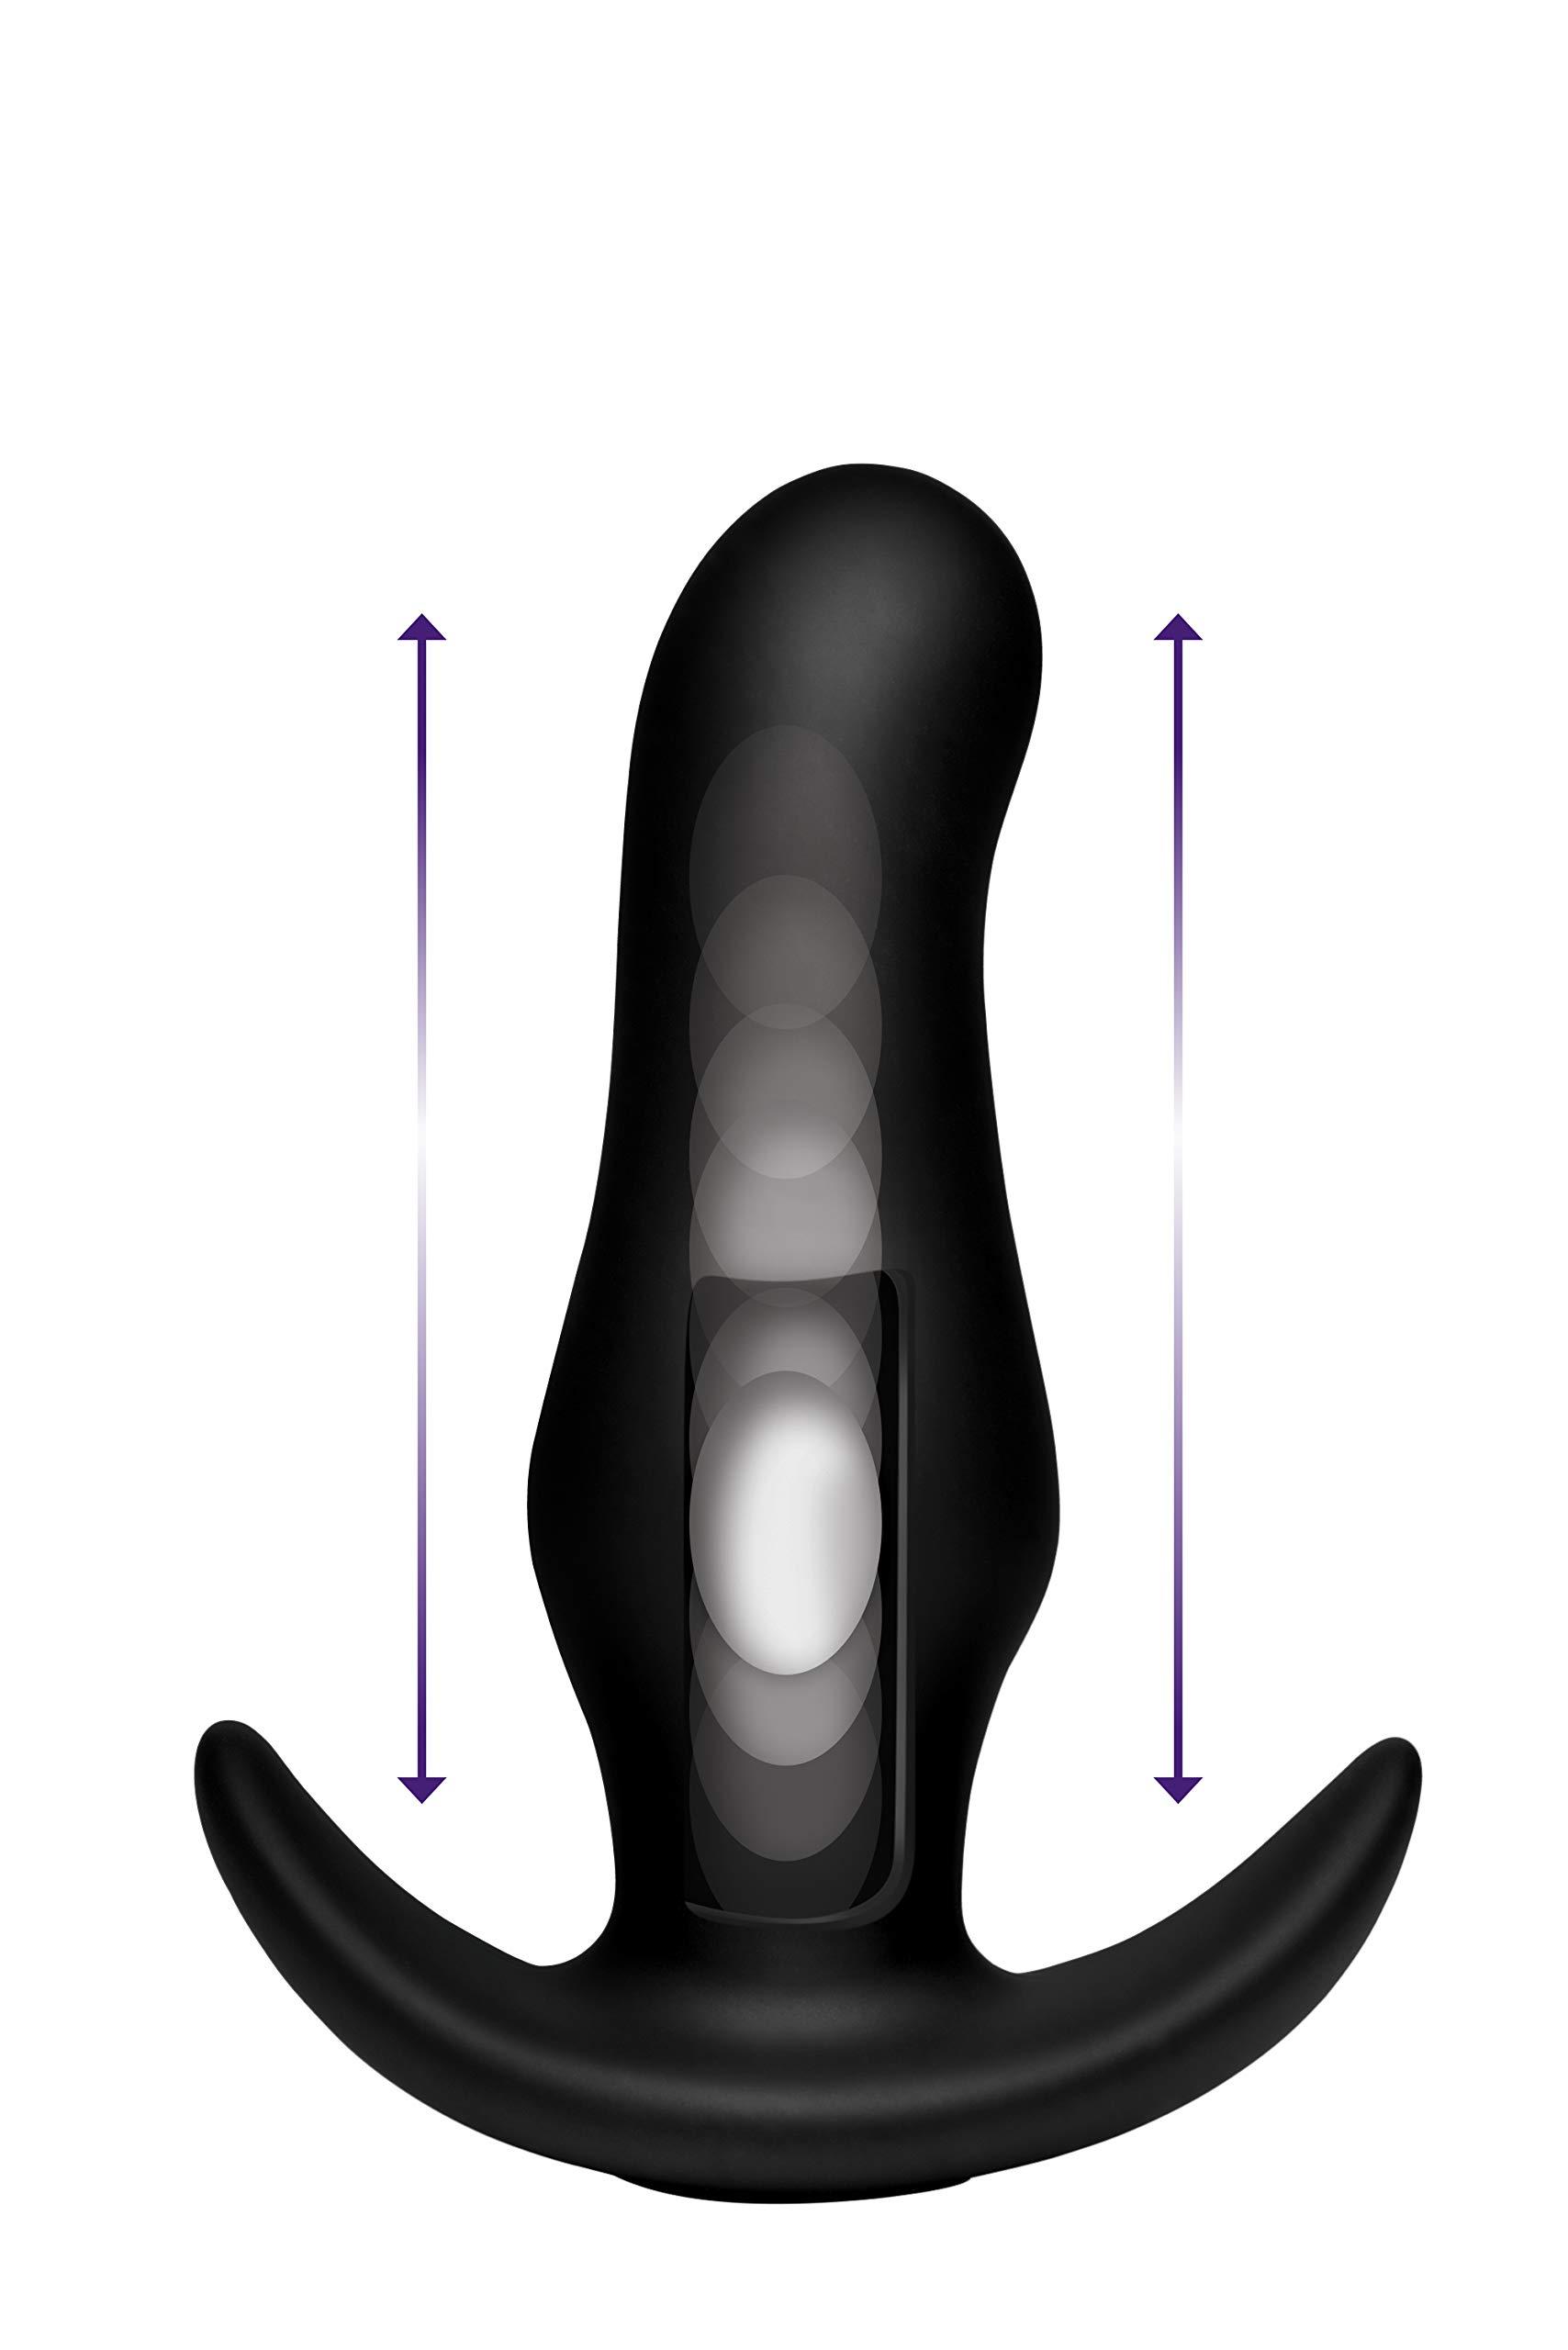 Thump It Kinetic Thumping 7x Anal Plug